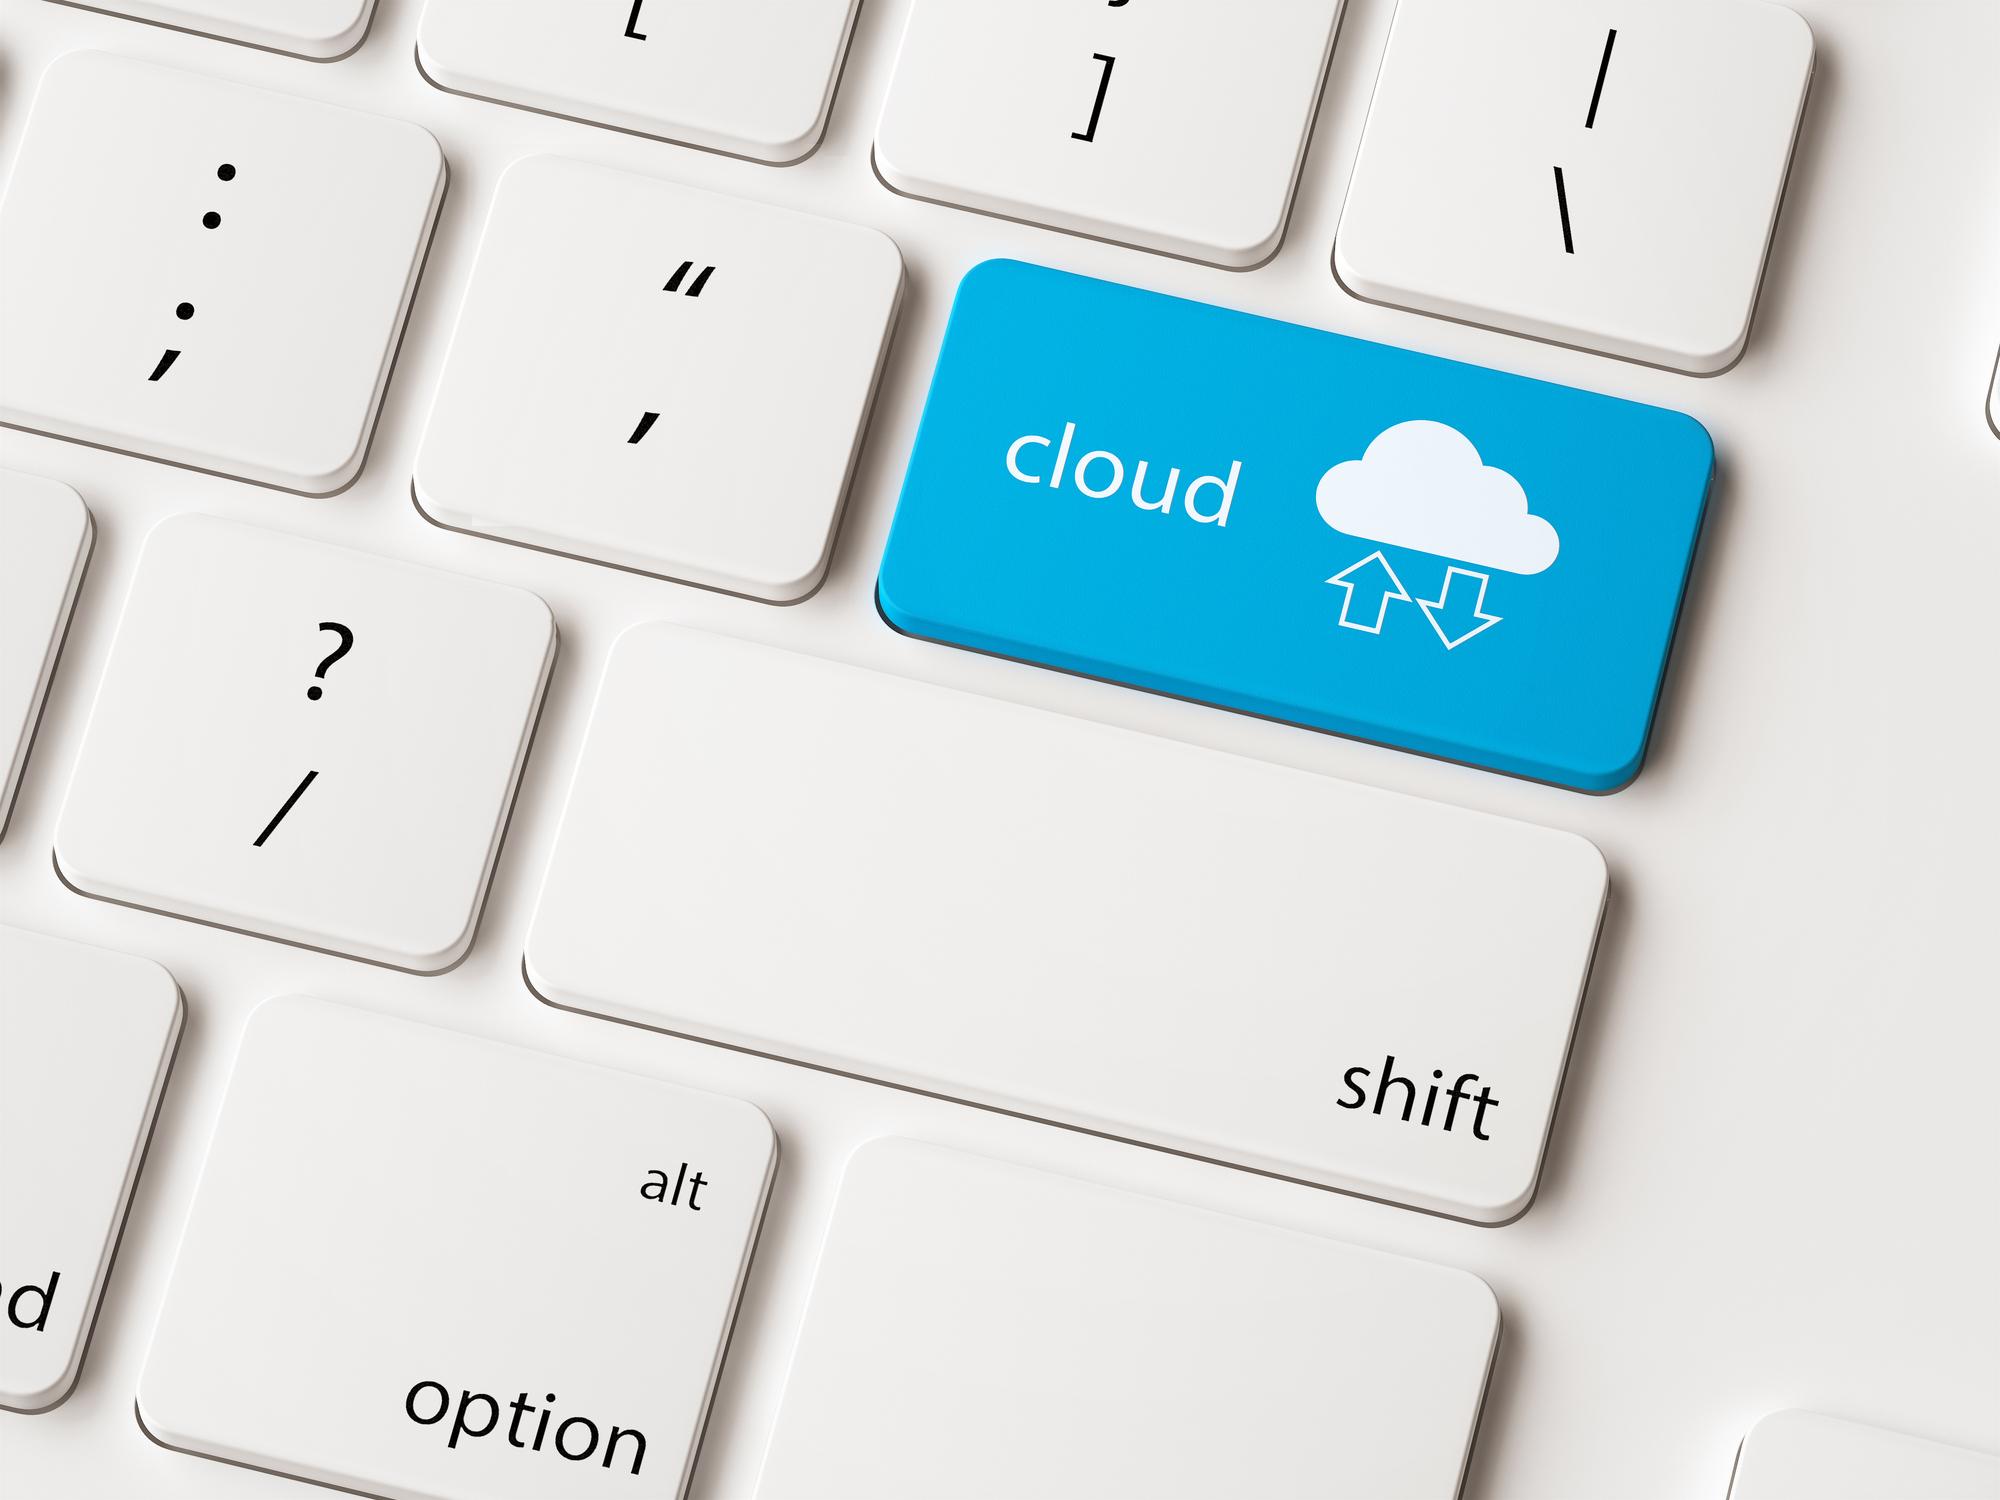 A key with a cloud symbol on a keyboard.